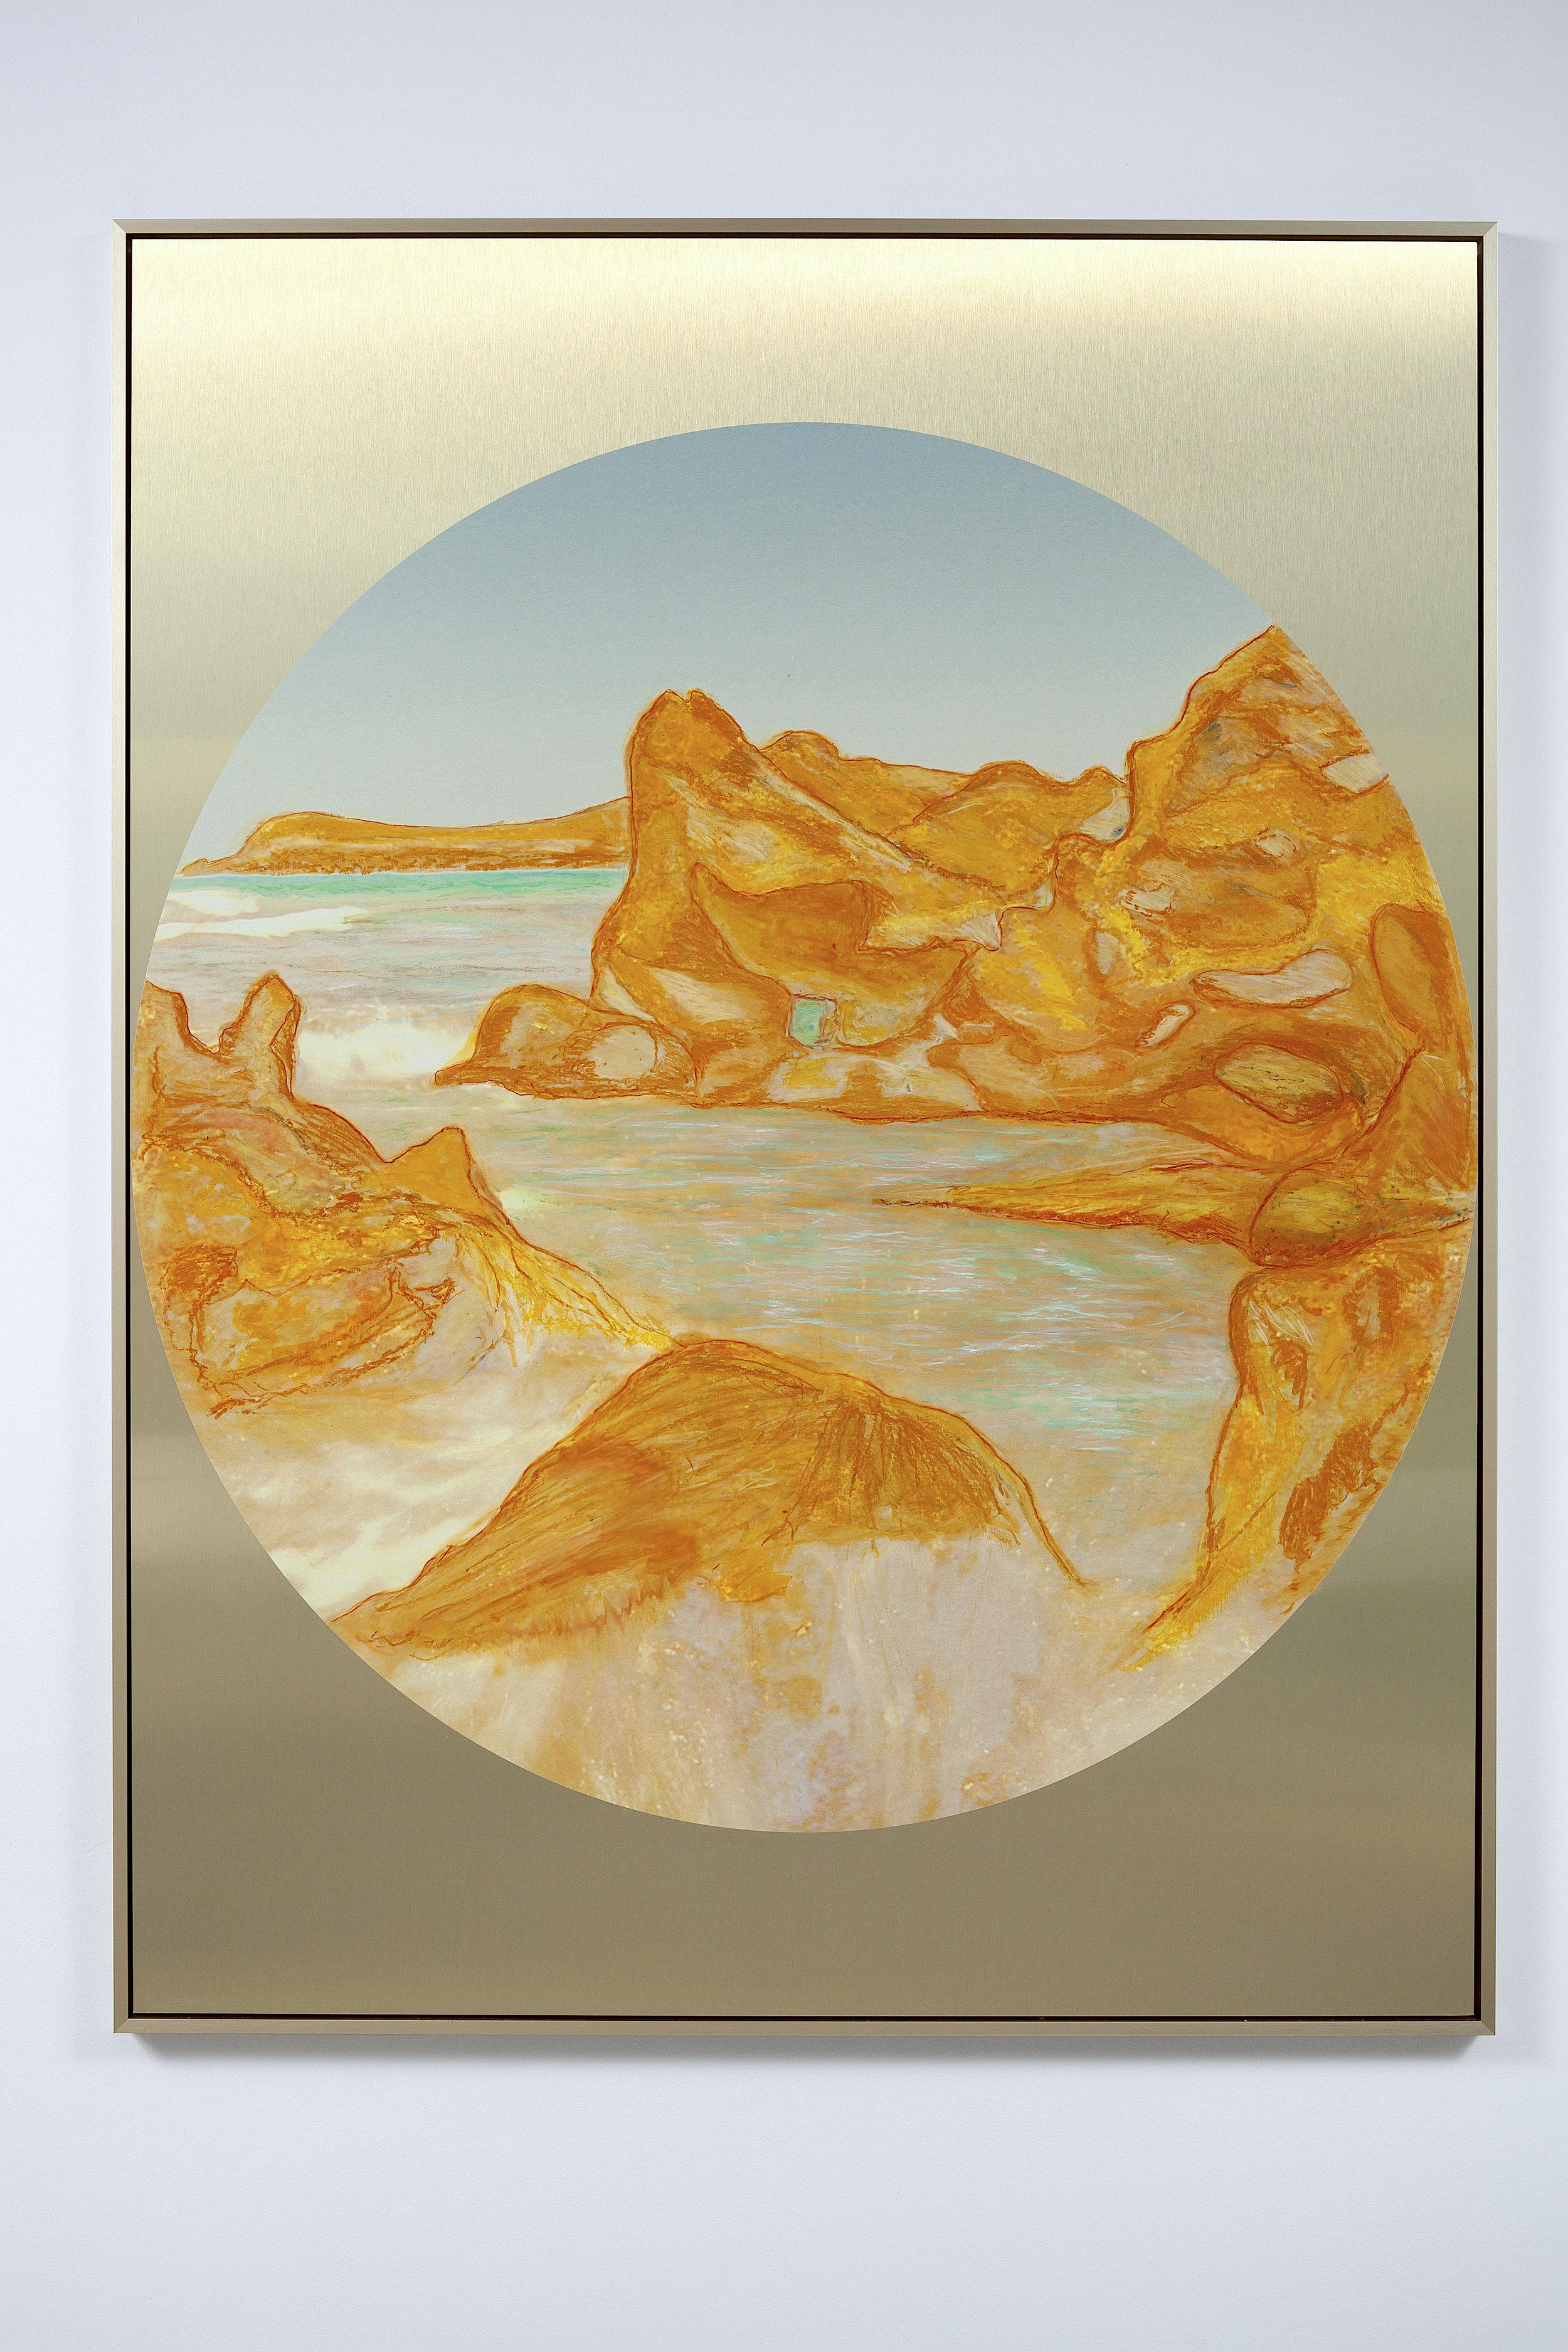 Beyond the Oecumene / Part XI,  2019 Wax pastels, UV-print on gold Alu-Dibond 160 x 120 cm (63 x 47 in)